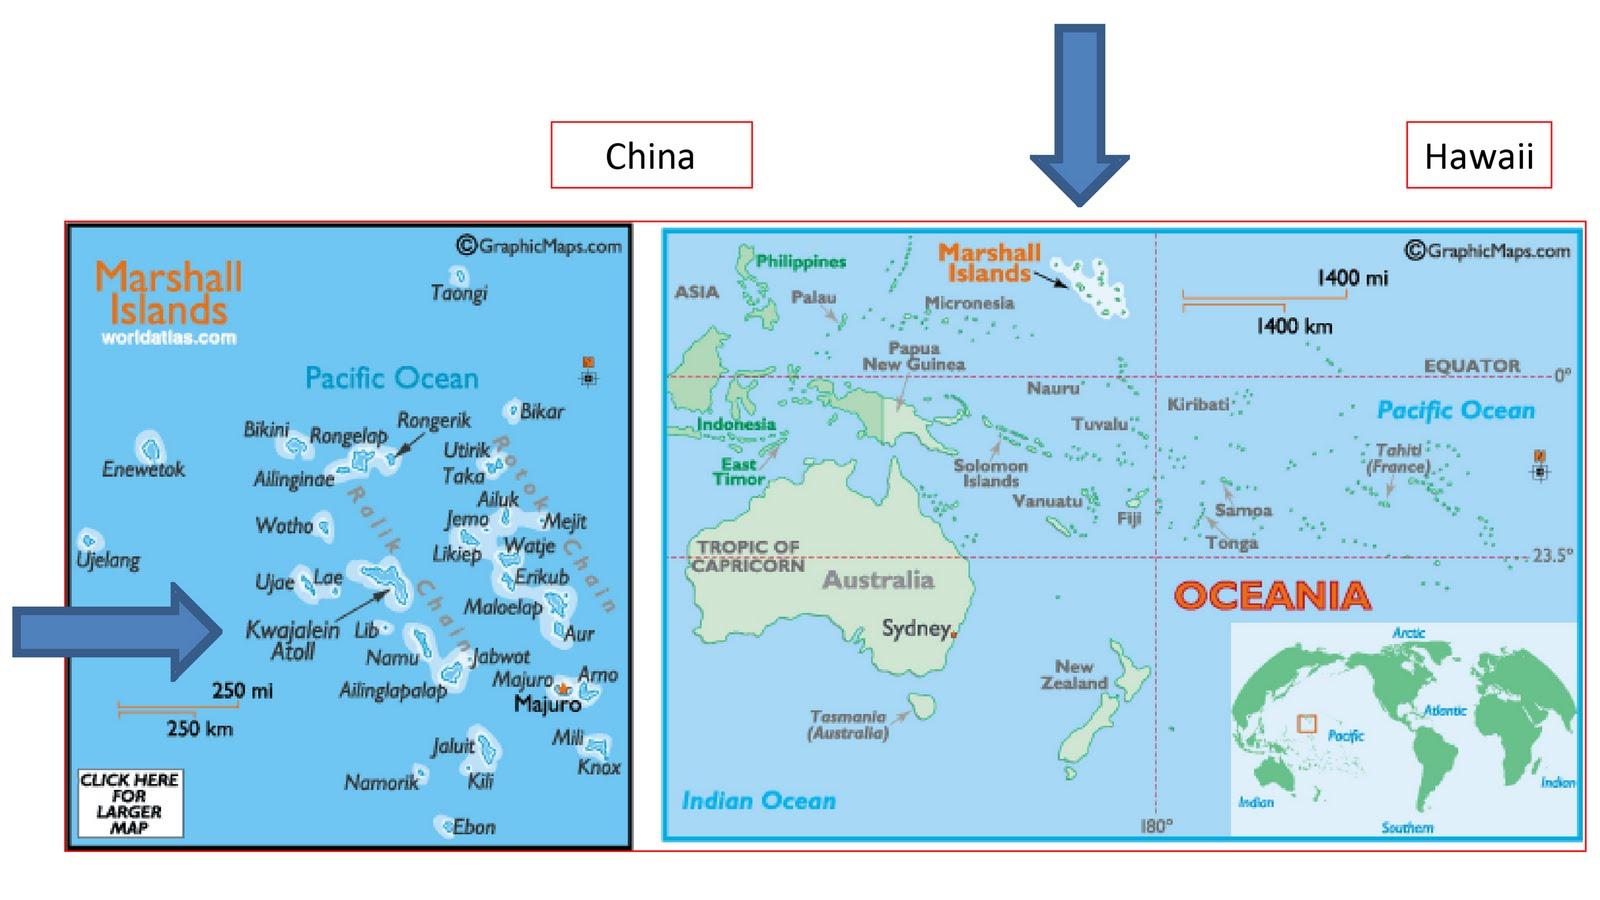 Flat Stanley MHS: Kwajalein, Marshall Islands on baghdad map, battle of kwajalein, london map, nouakchott map, pacific campaign map, johnston atoll, samoa map, atoll islands map, tarawa atoll, gb map, battle of eniwetok, guadalcanal island map, german cruiser prinz eugen, truk lagoon, majuro map, new ireland island map, eniwetok map, wwii guadalcanal map, marshall islands map, wake island, ebeye map, bucholz army airfield, pagan island map, battle of surigao strait map, marshall islands, tokyo map, ronald reagan ballistic missile defense test site, jaluit atoll map, barking sands kauai map, iran map,